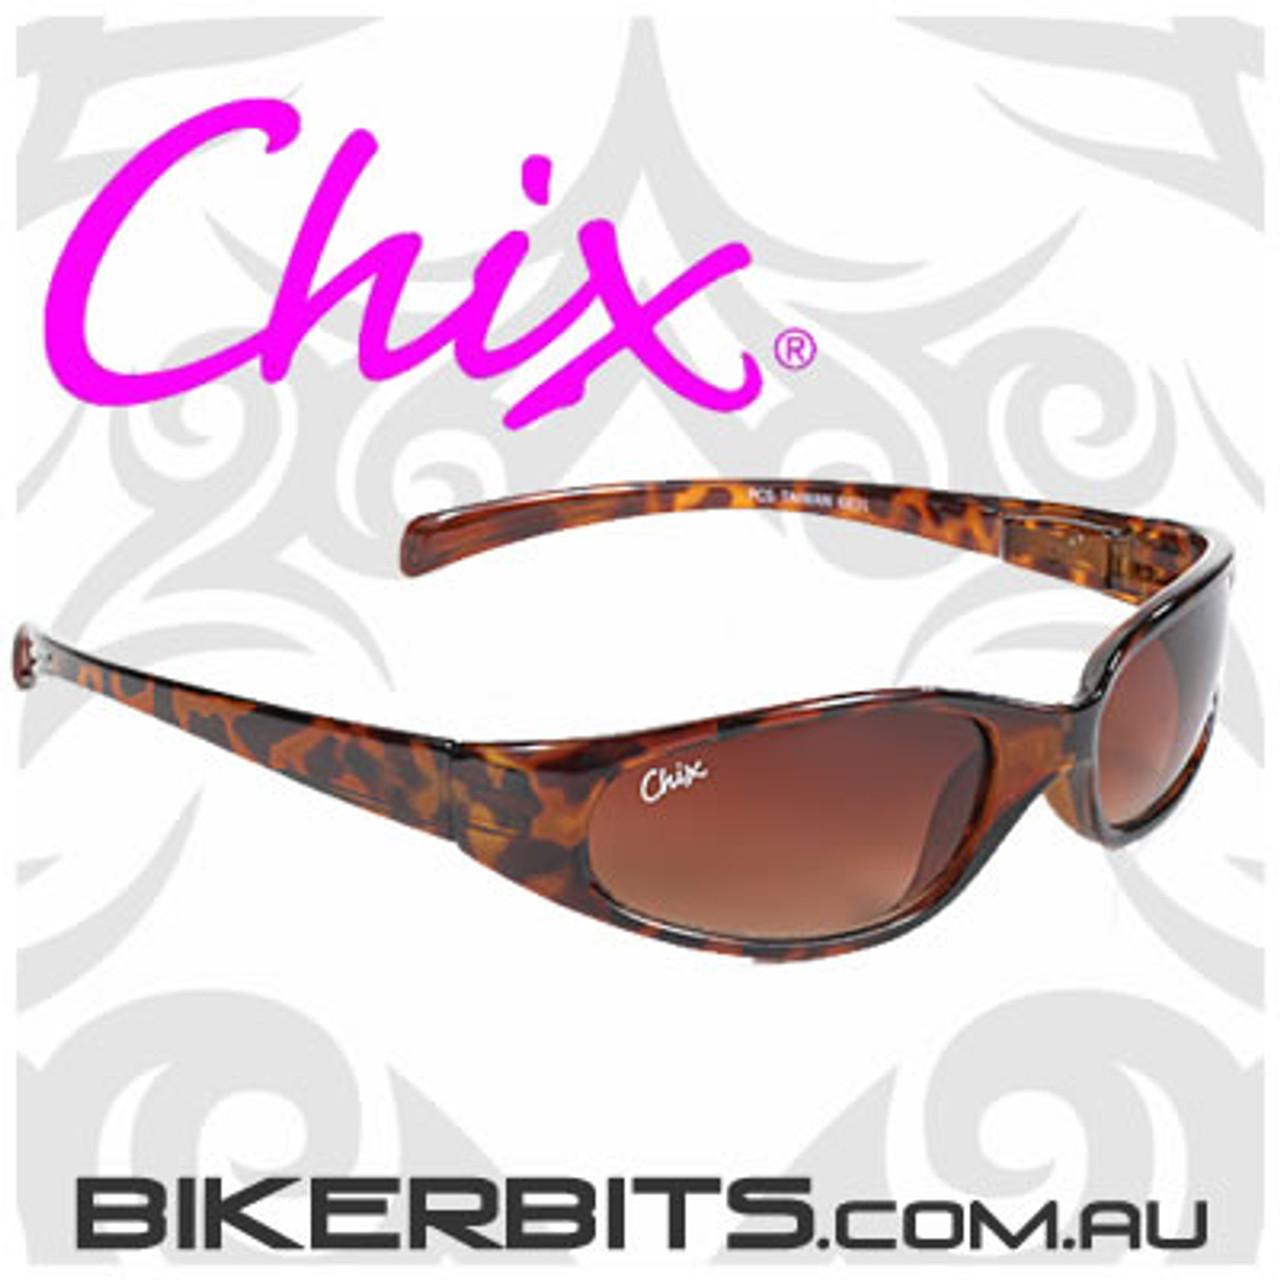 Motorcycle Sunglasses - Chix Heavenly - Brown Gradient/Tortoise